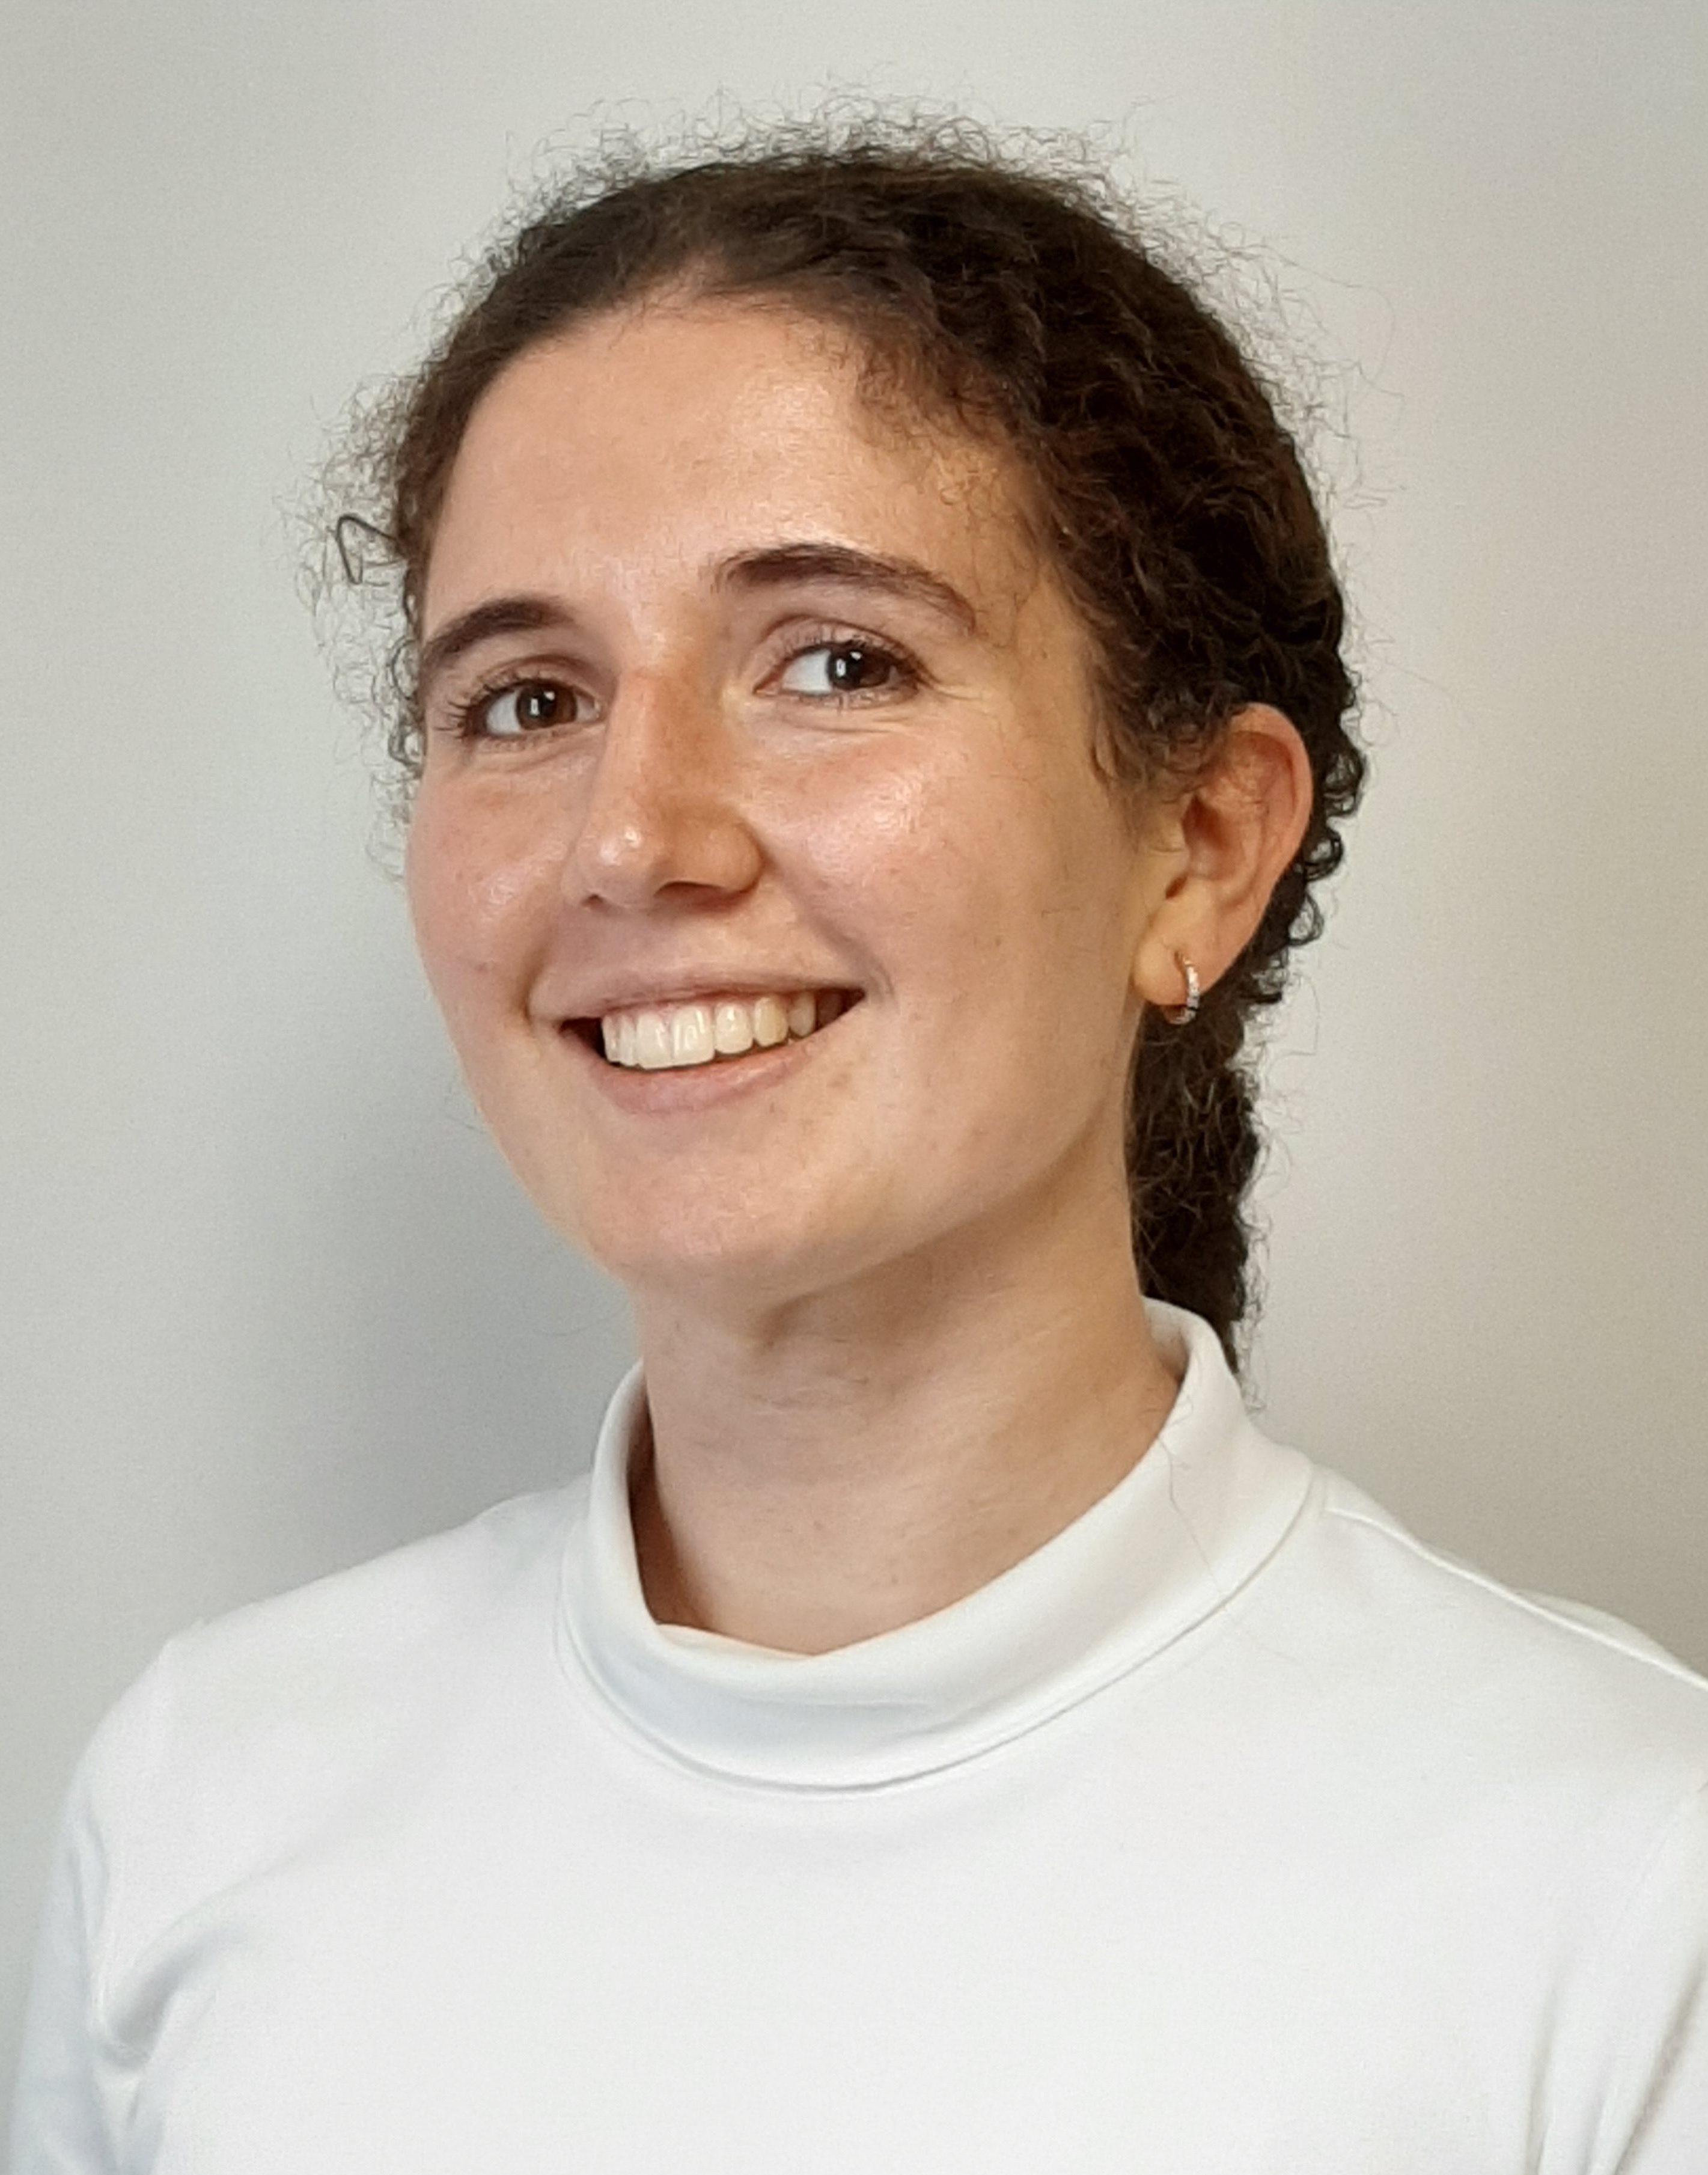 Sophia Sarkis